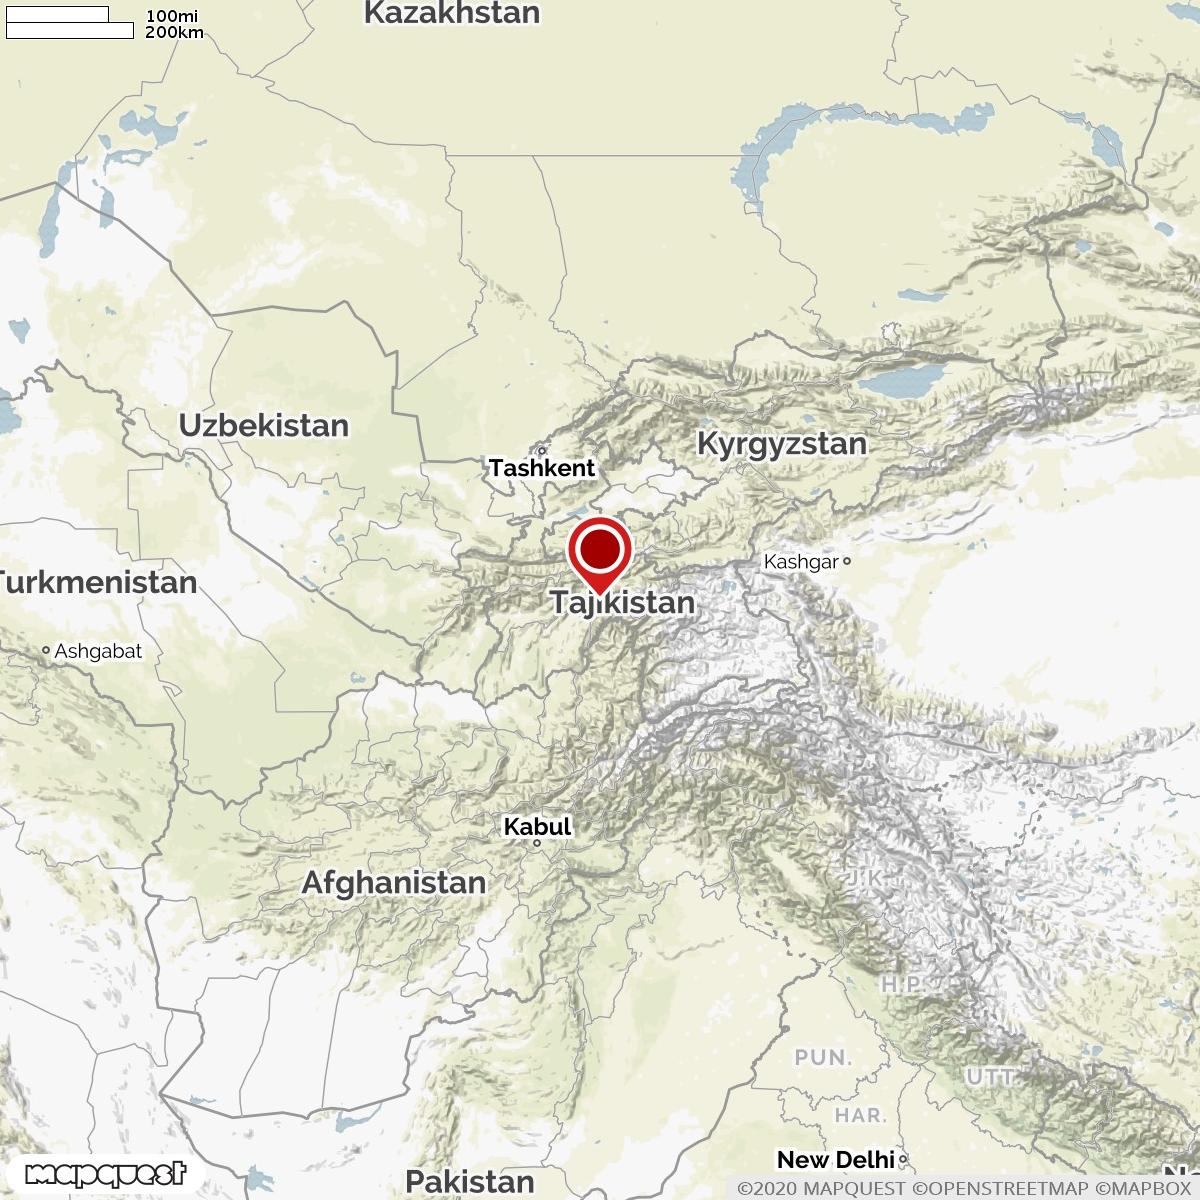 спутник картинка таджикистан ледобура состоит